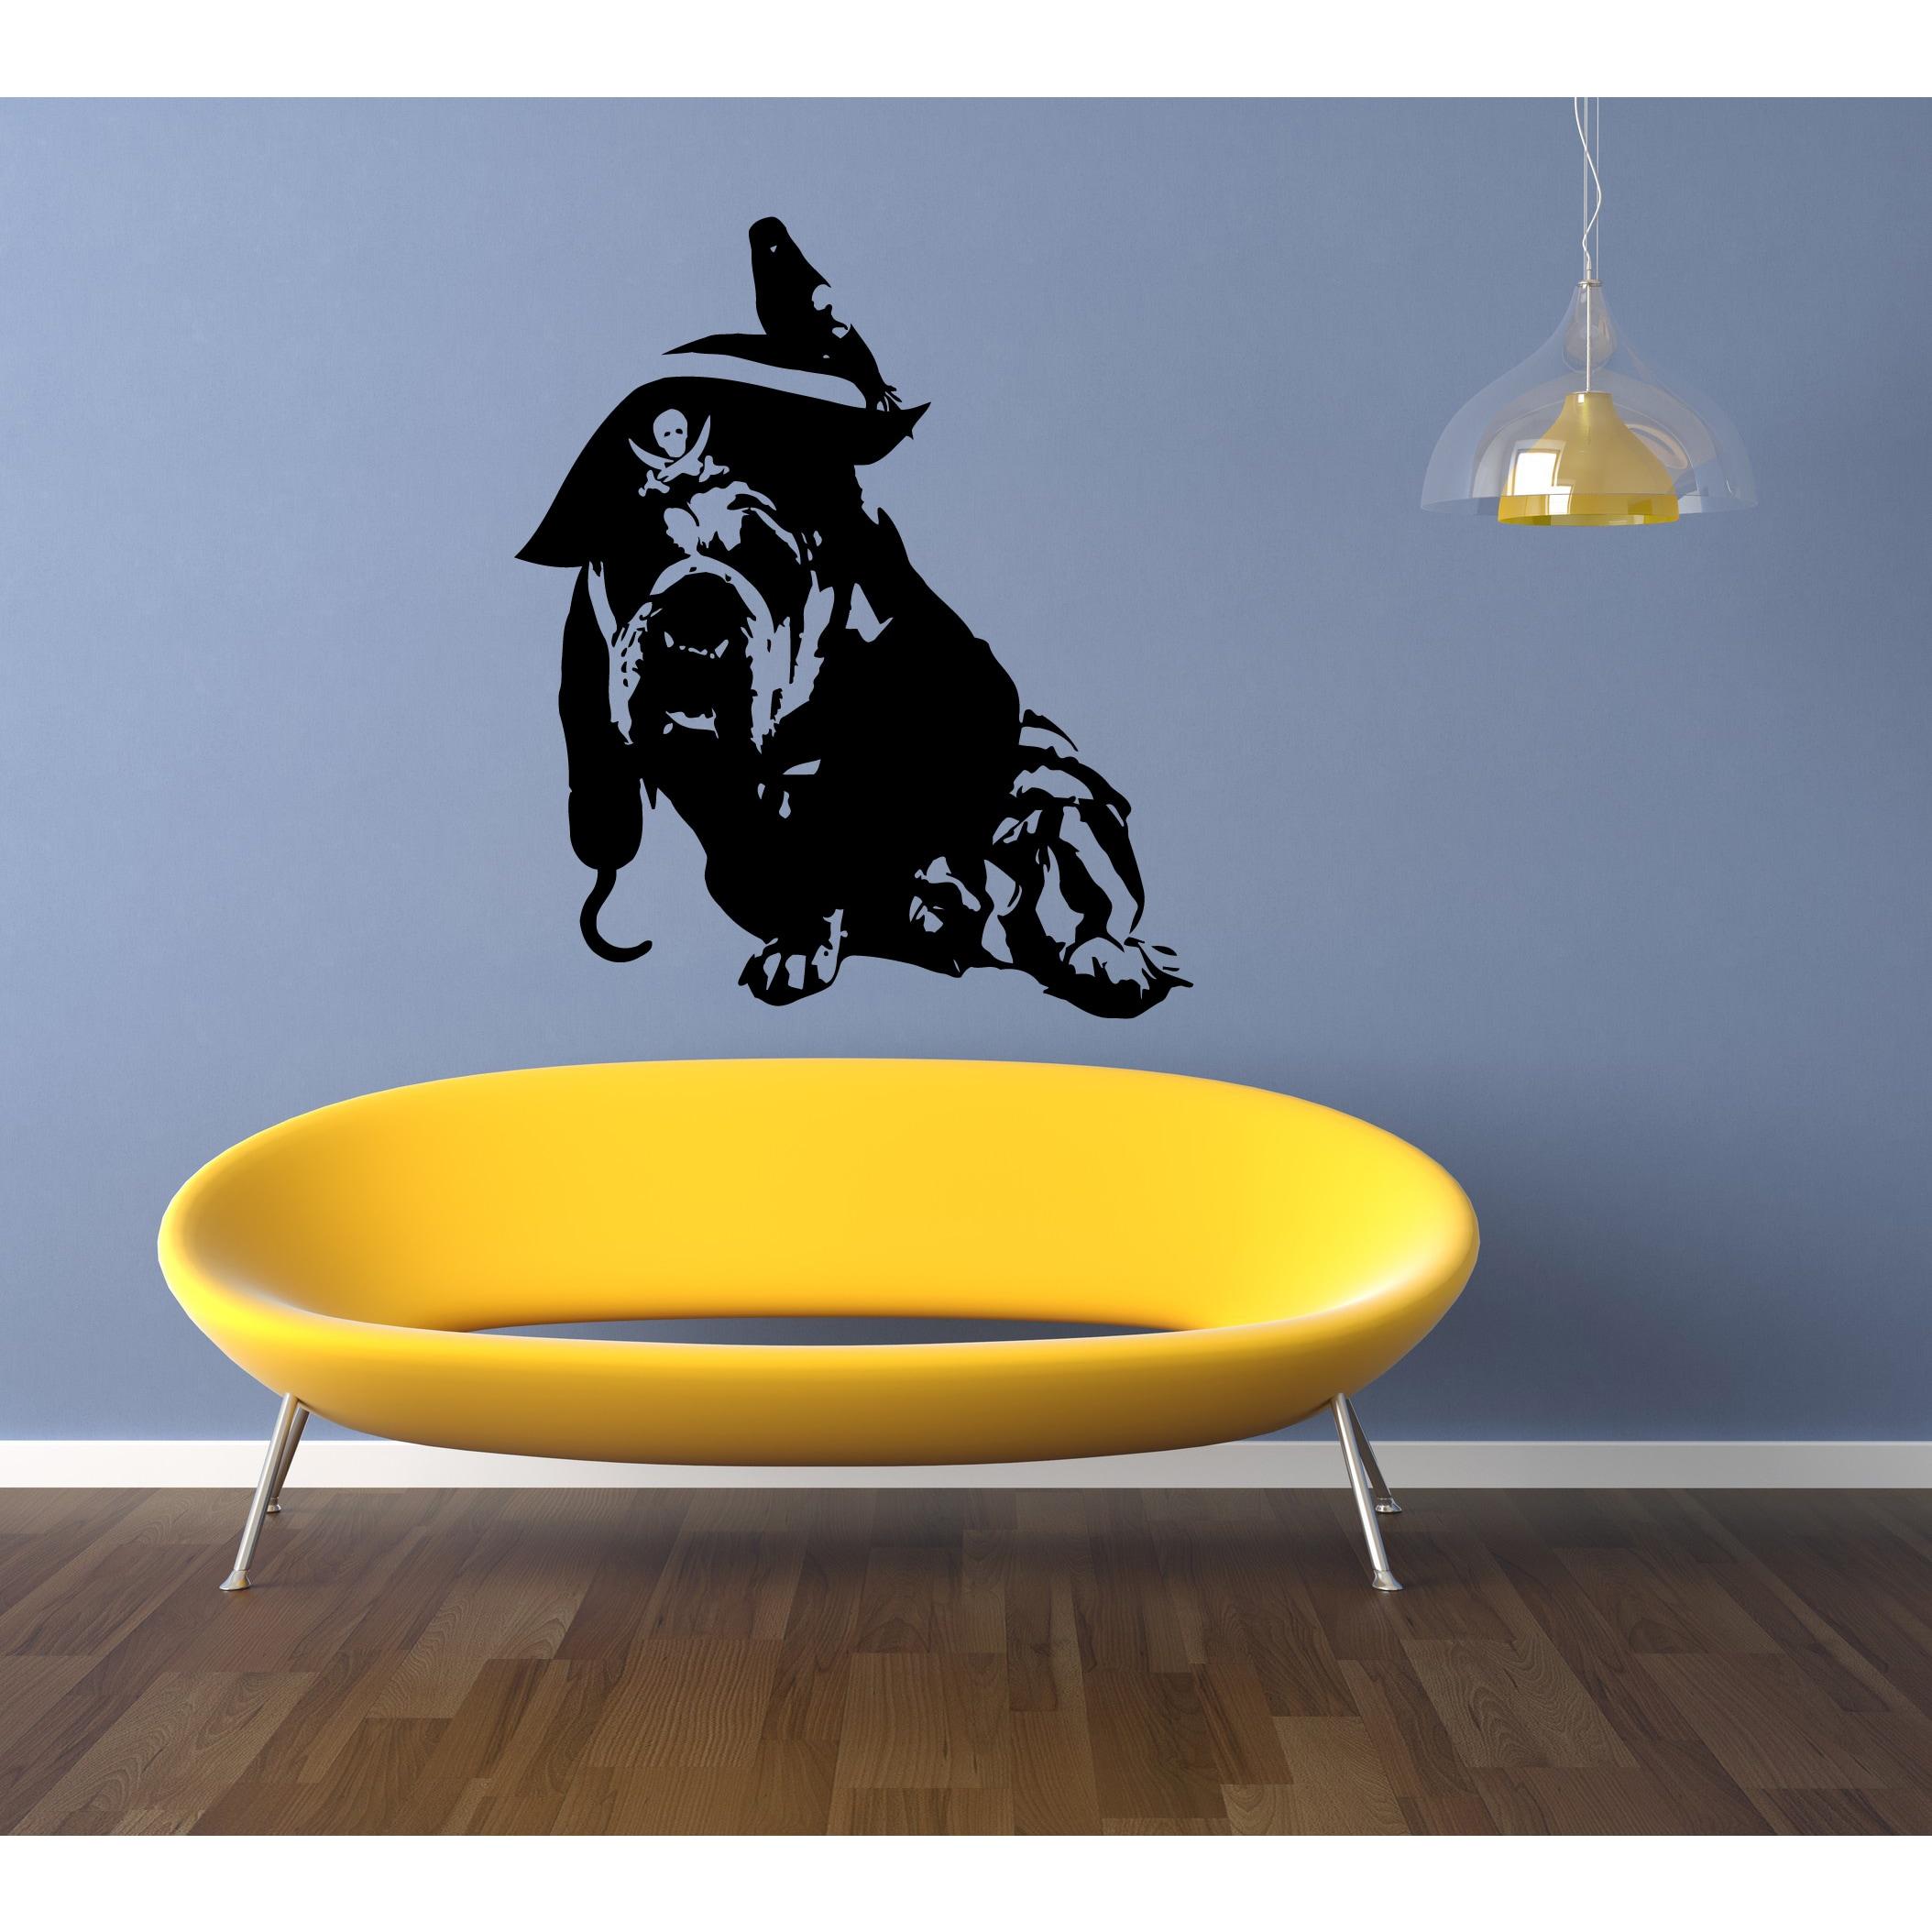 English Bulldog Pirate and Parrot Wall Art Sticker Decal | eBay